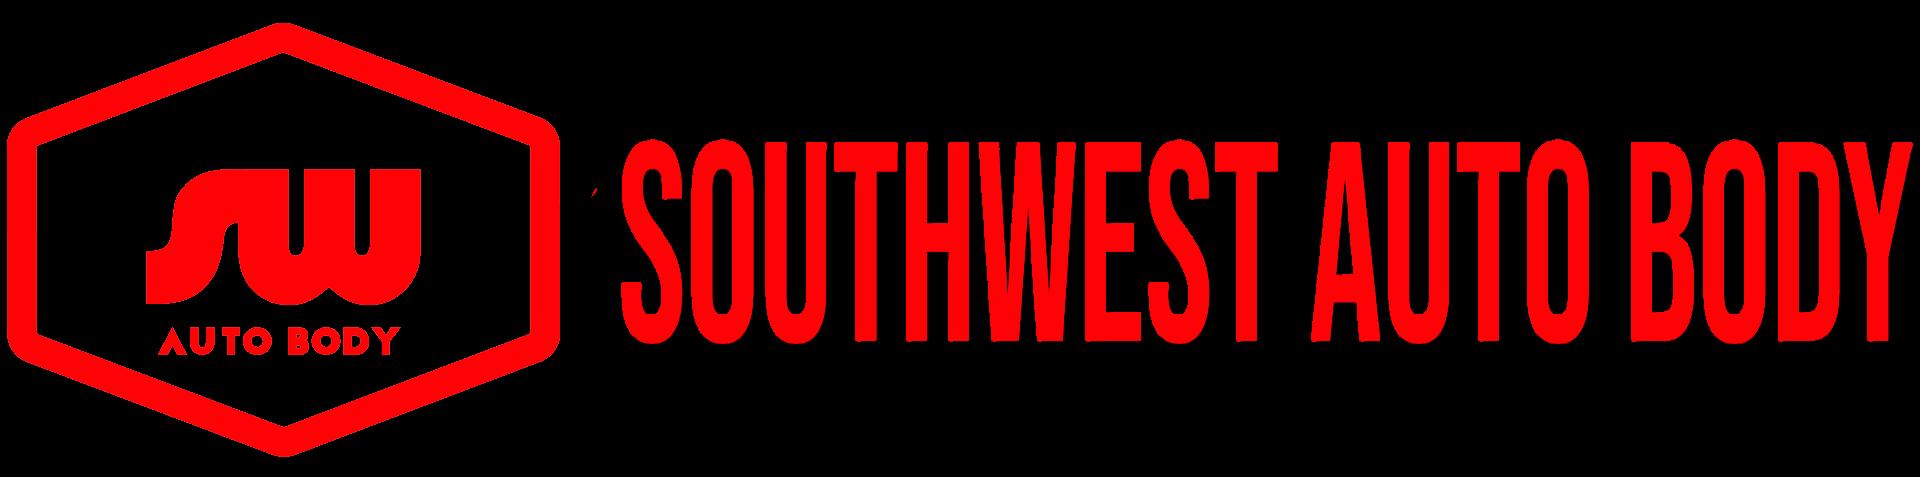 Southwest Auto Body